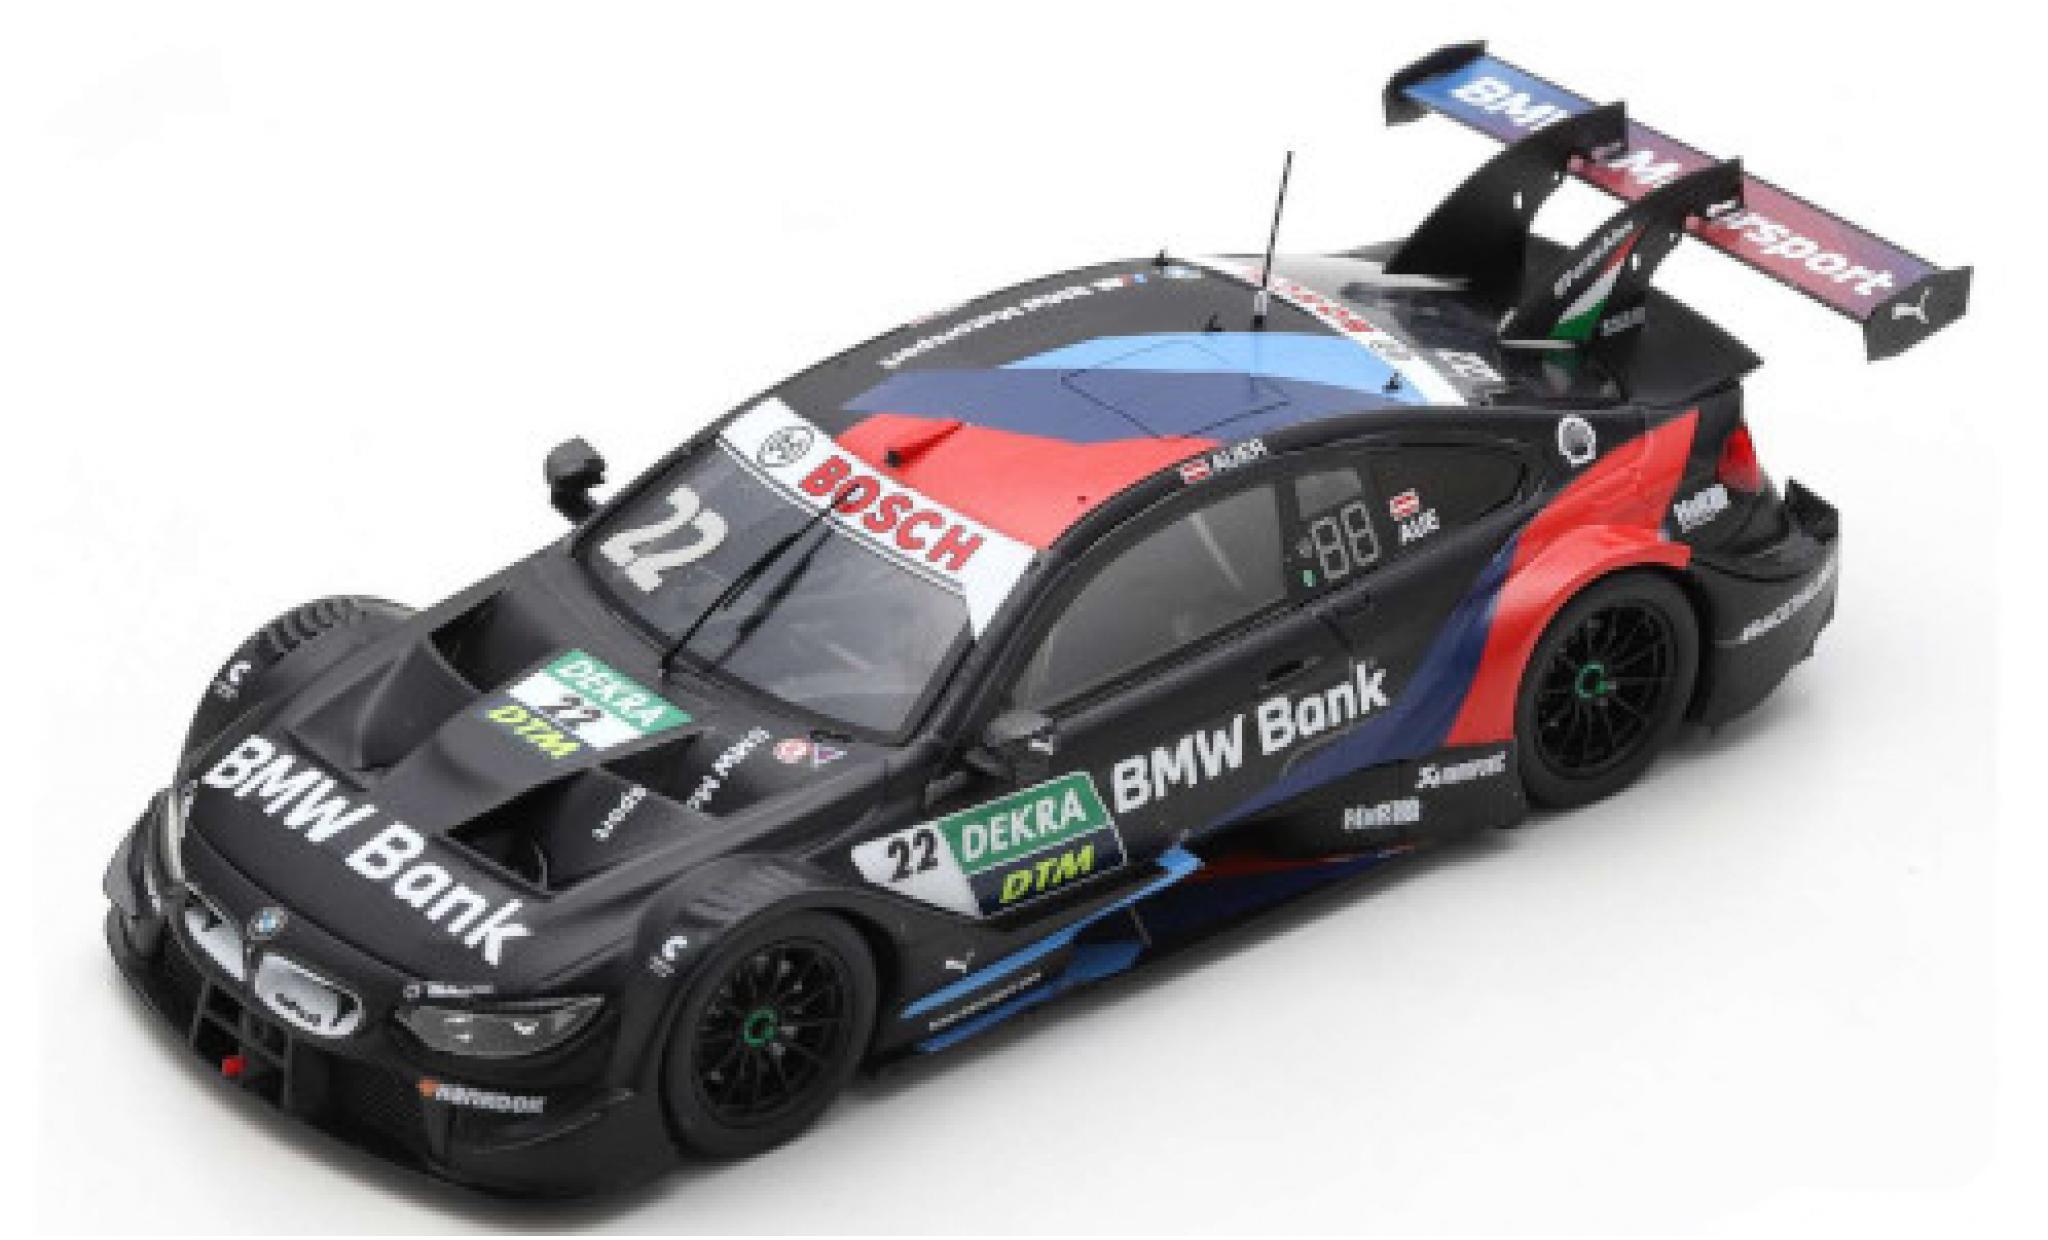 Bmw M4 1/43 Spark DTM No.22 Team RMR Bank DTM Hockenheim 2020 L.Auer